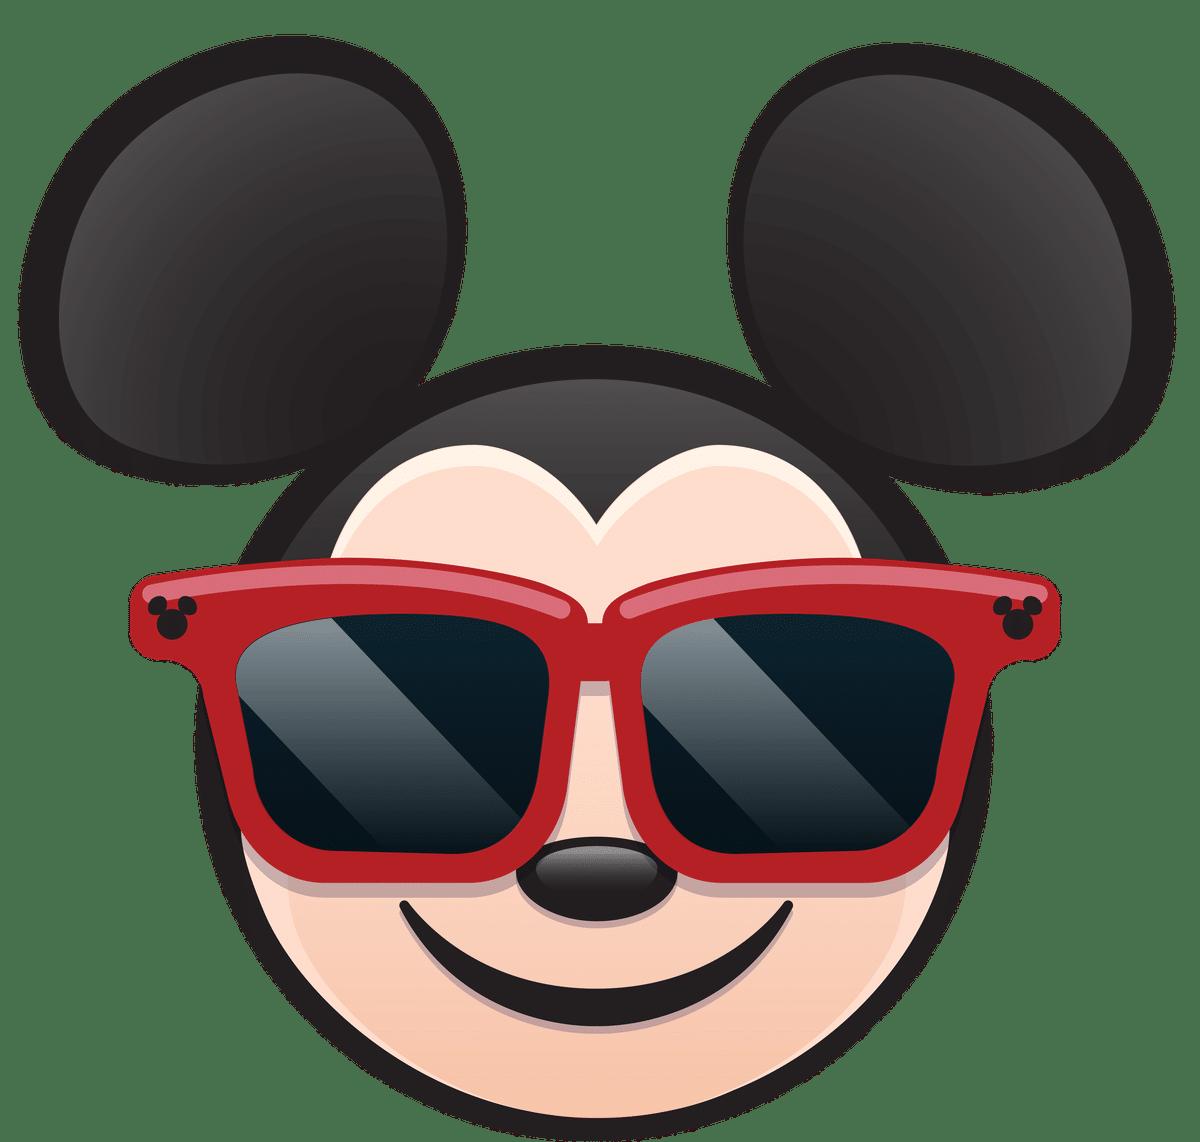 Sunglasses Mickey